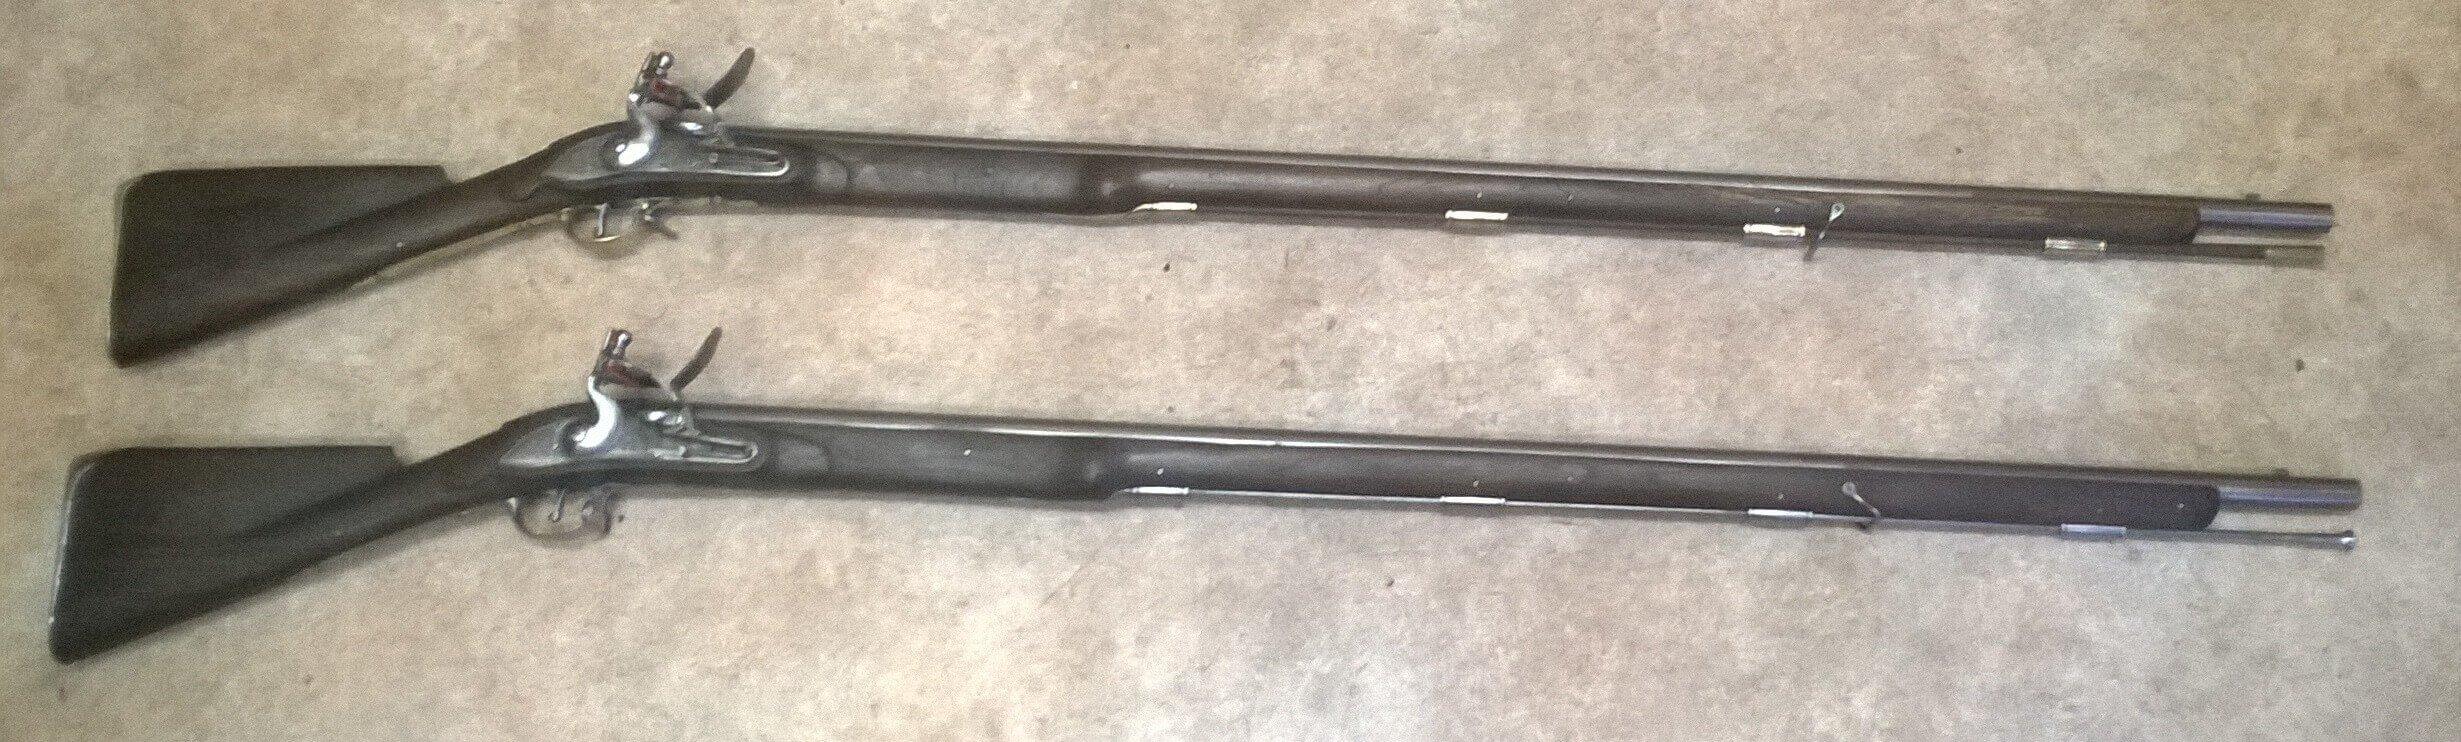 1728 (Early) Longland Pattern Musket